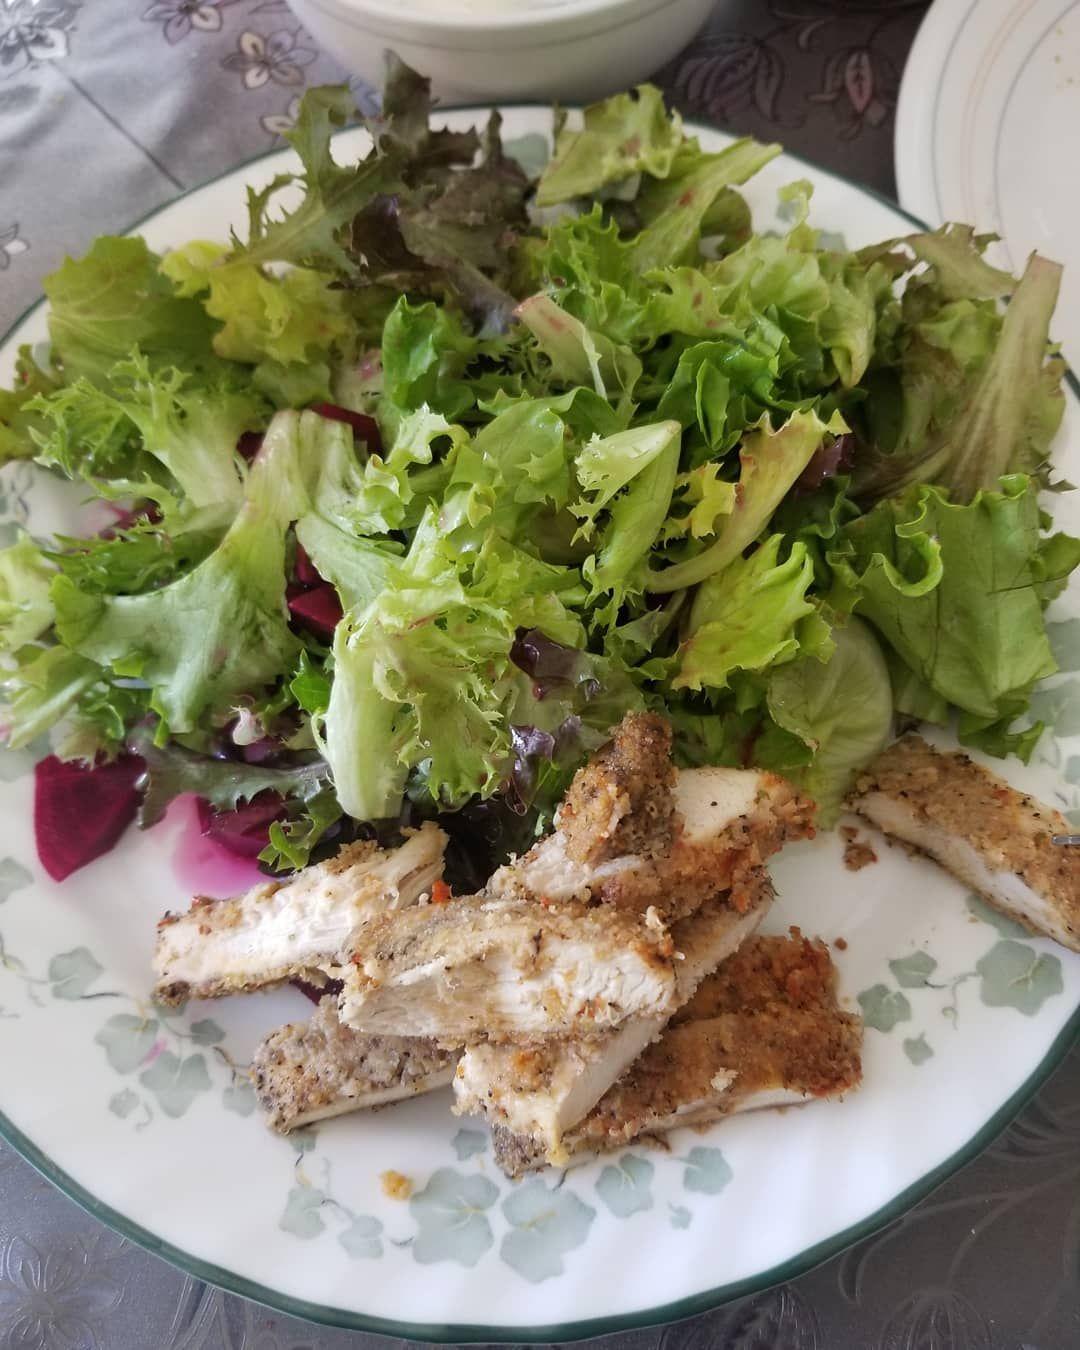 My dinner #zayifliyoruz #sagliklibeslenme #kilover #zayifla #fitness #yegfitness #kilover